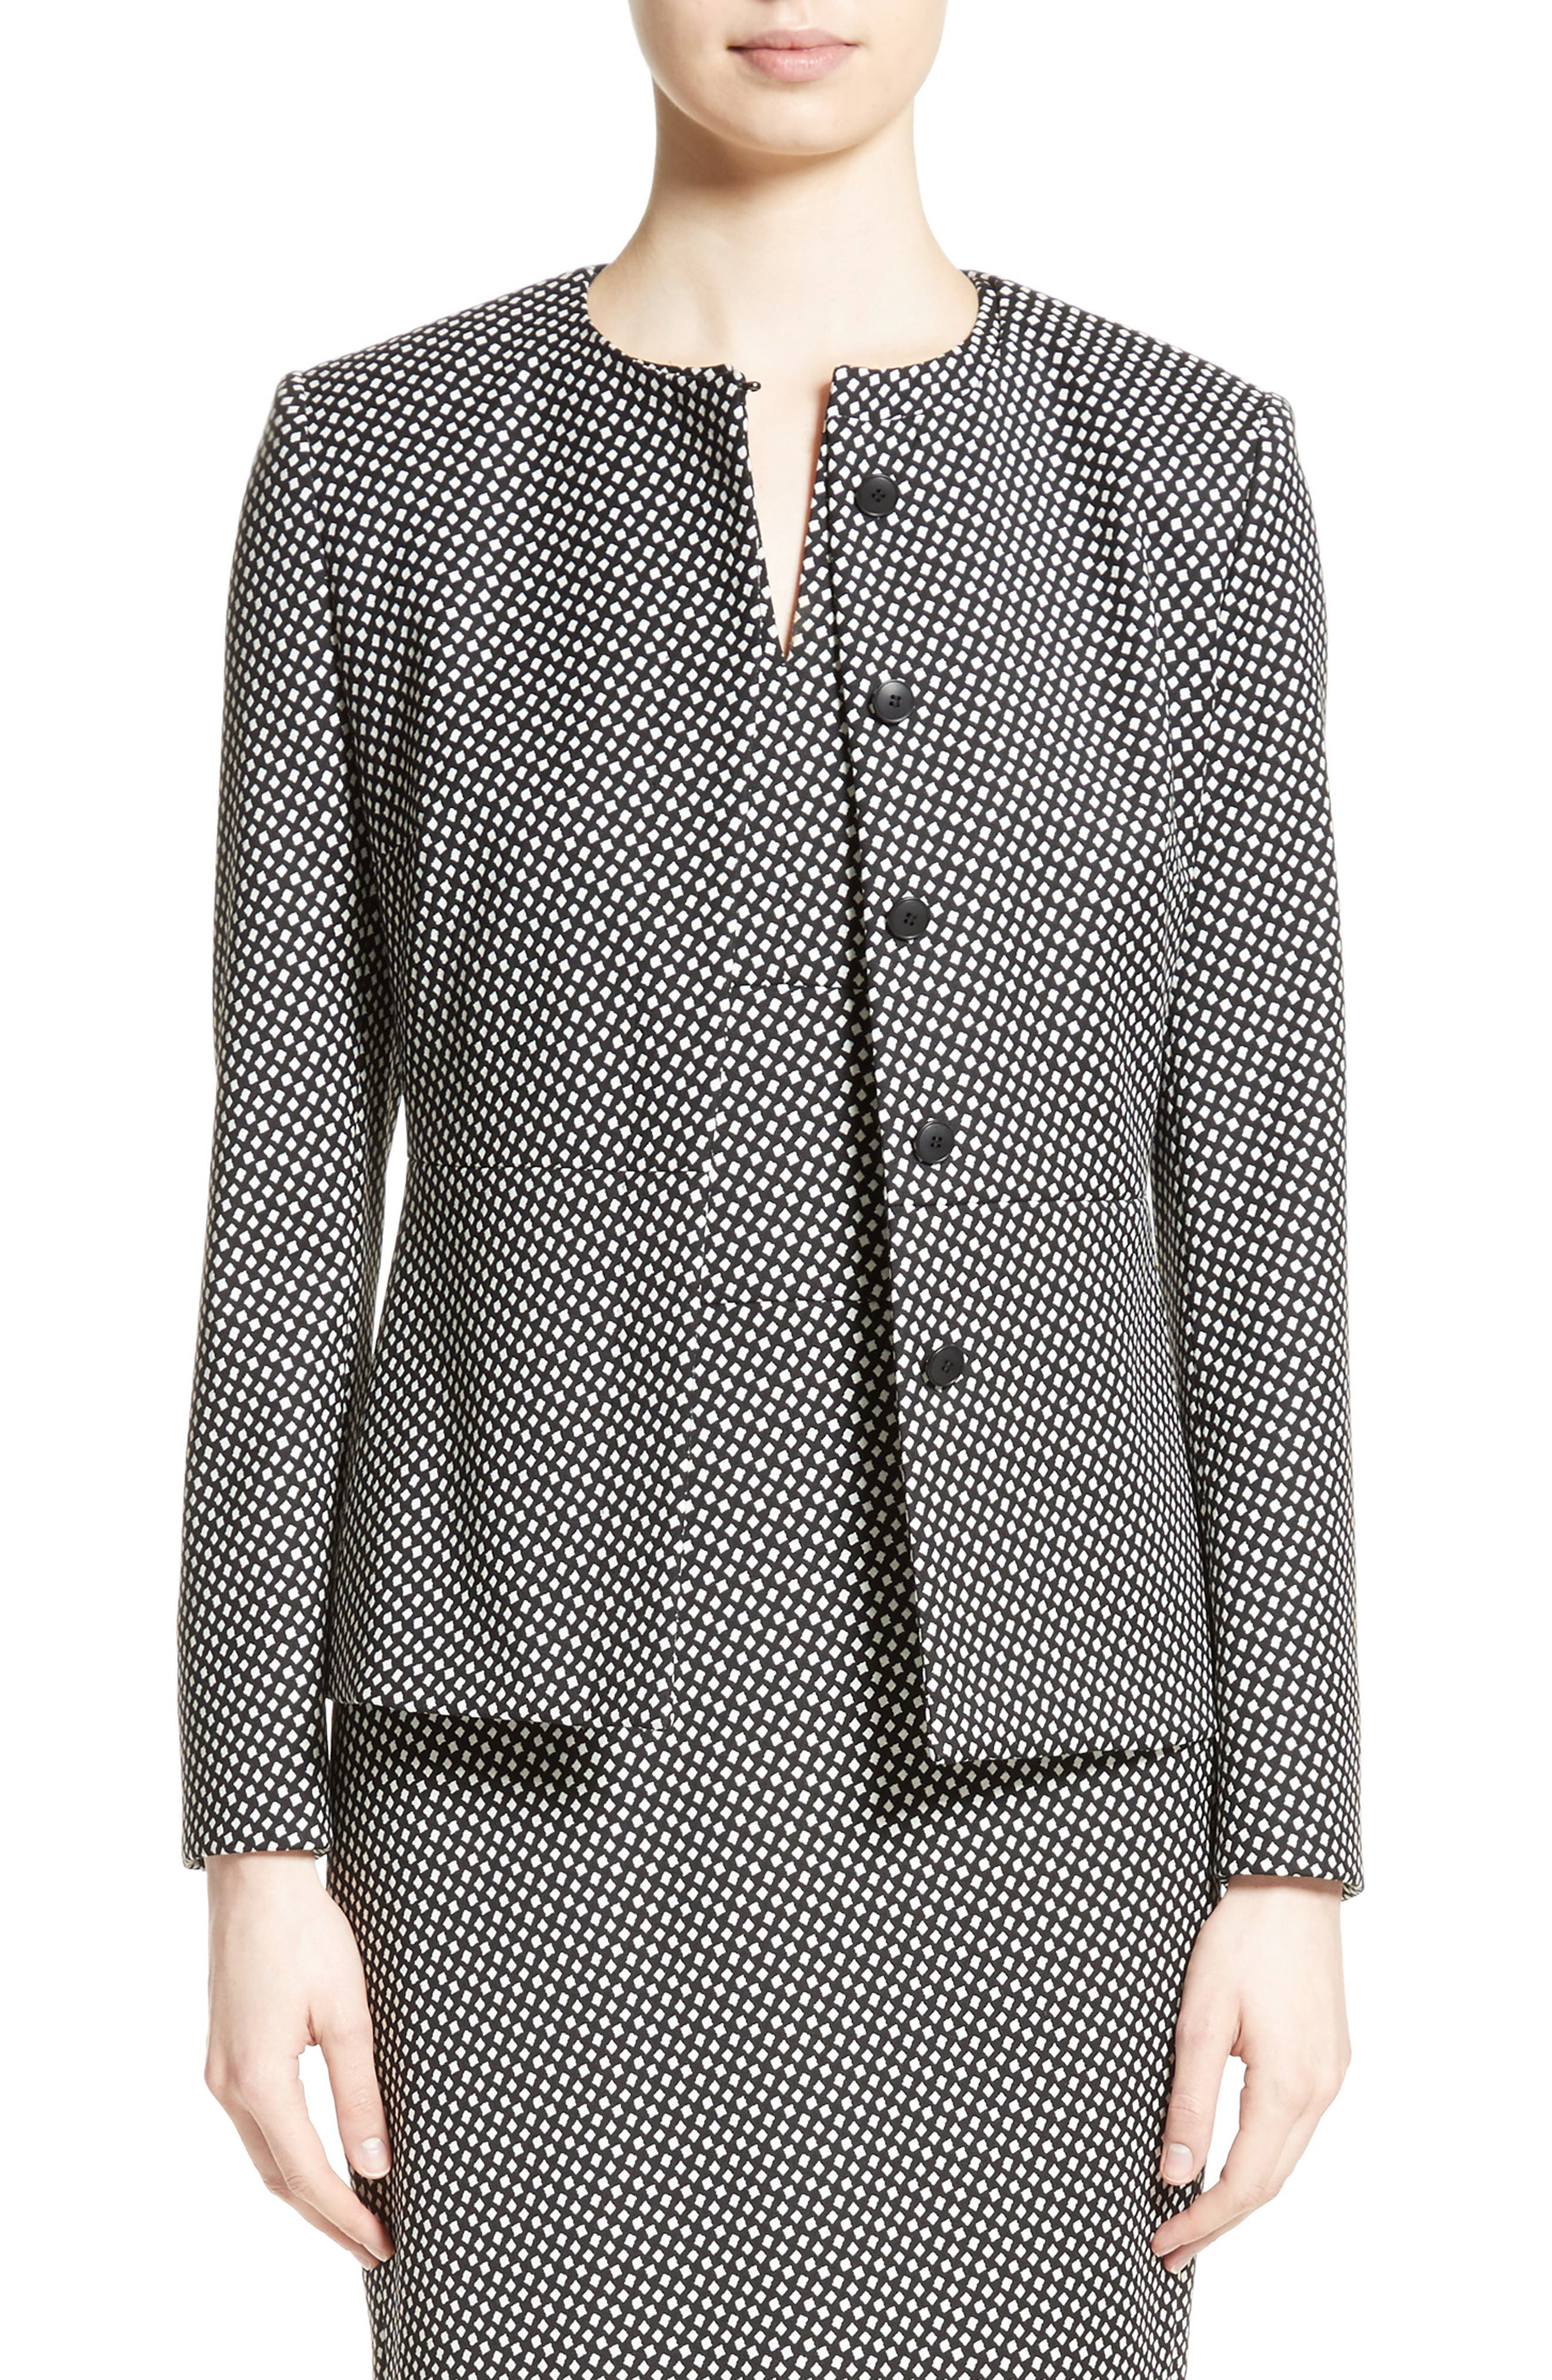 Max Mara Ajaccio Wool Blend Jacquard Jacket